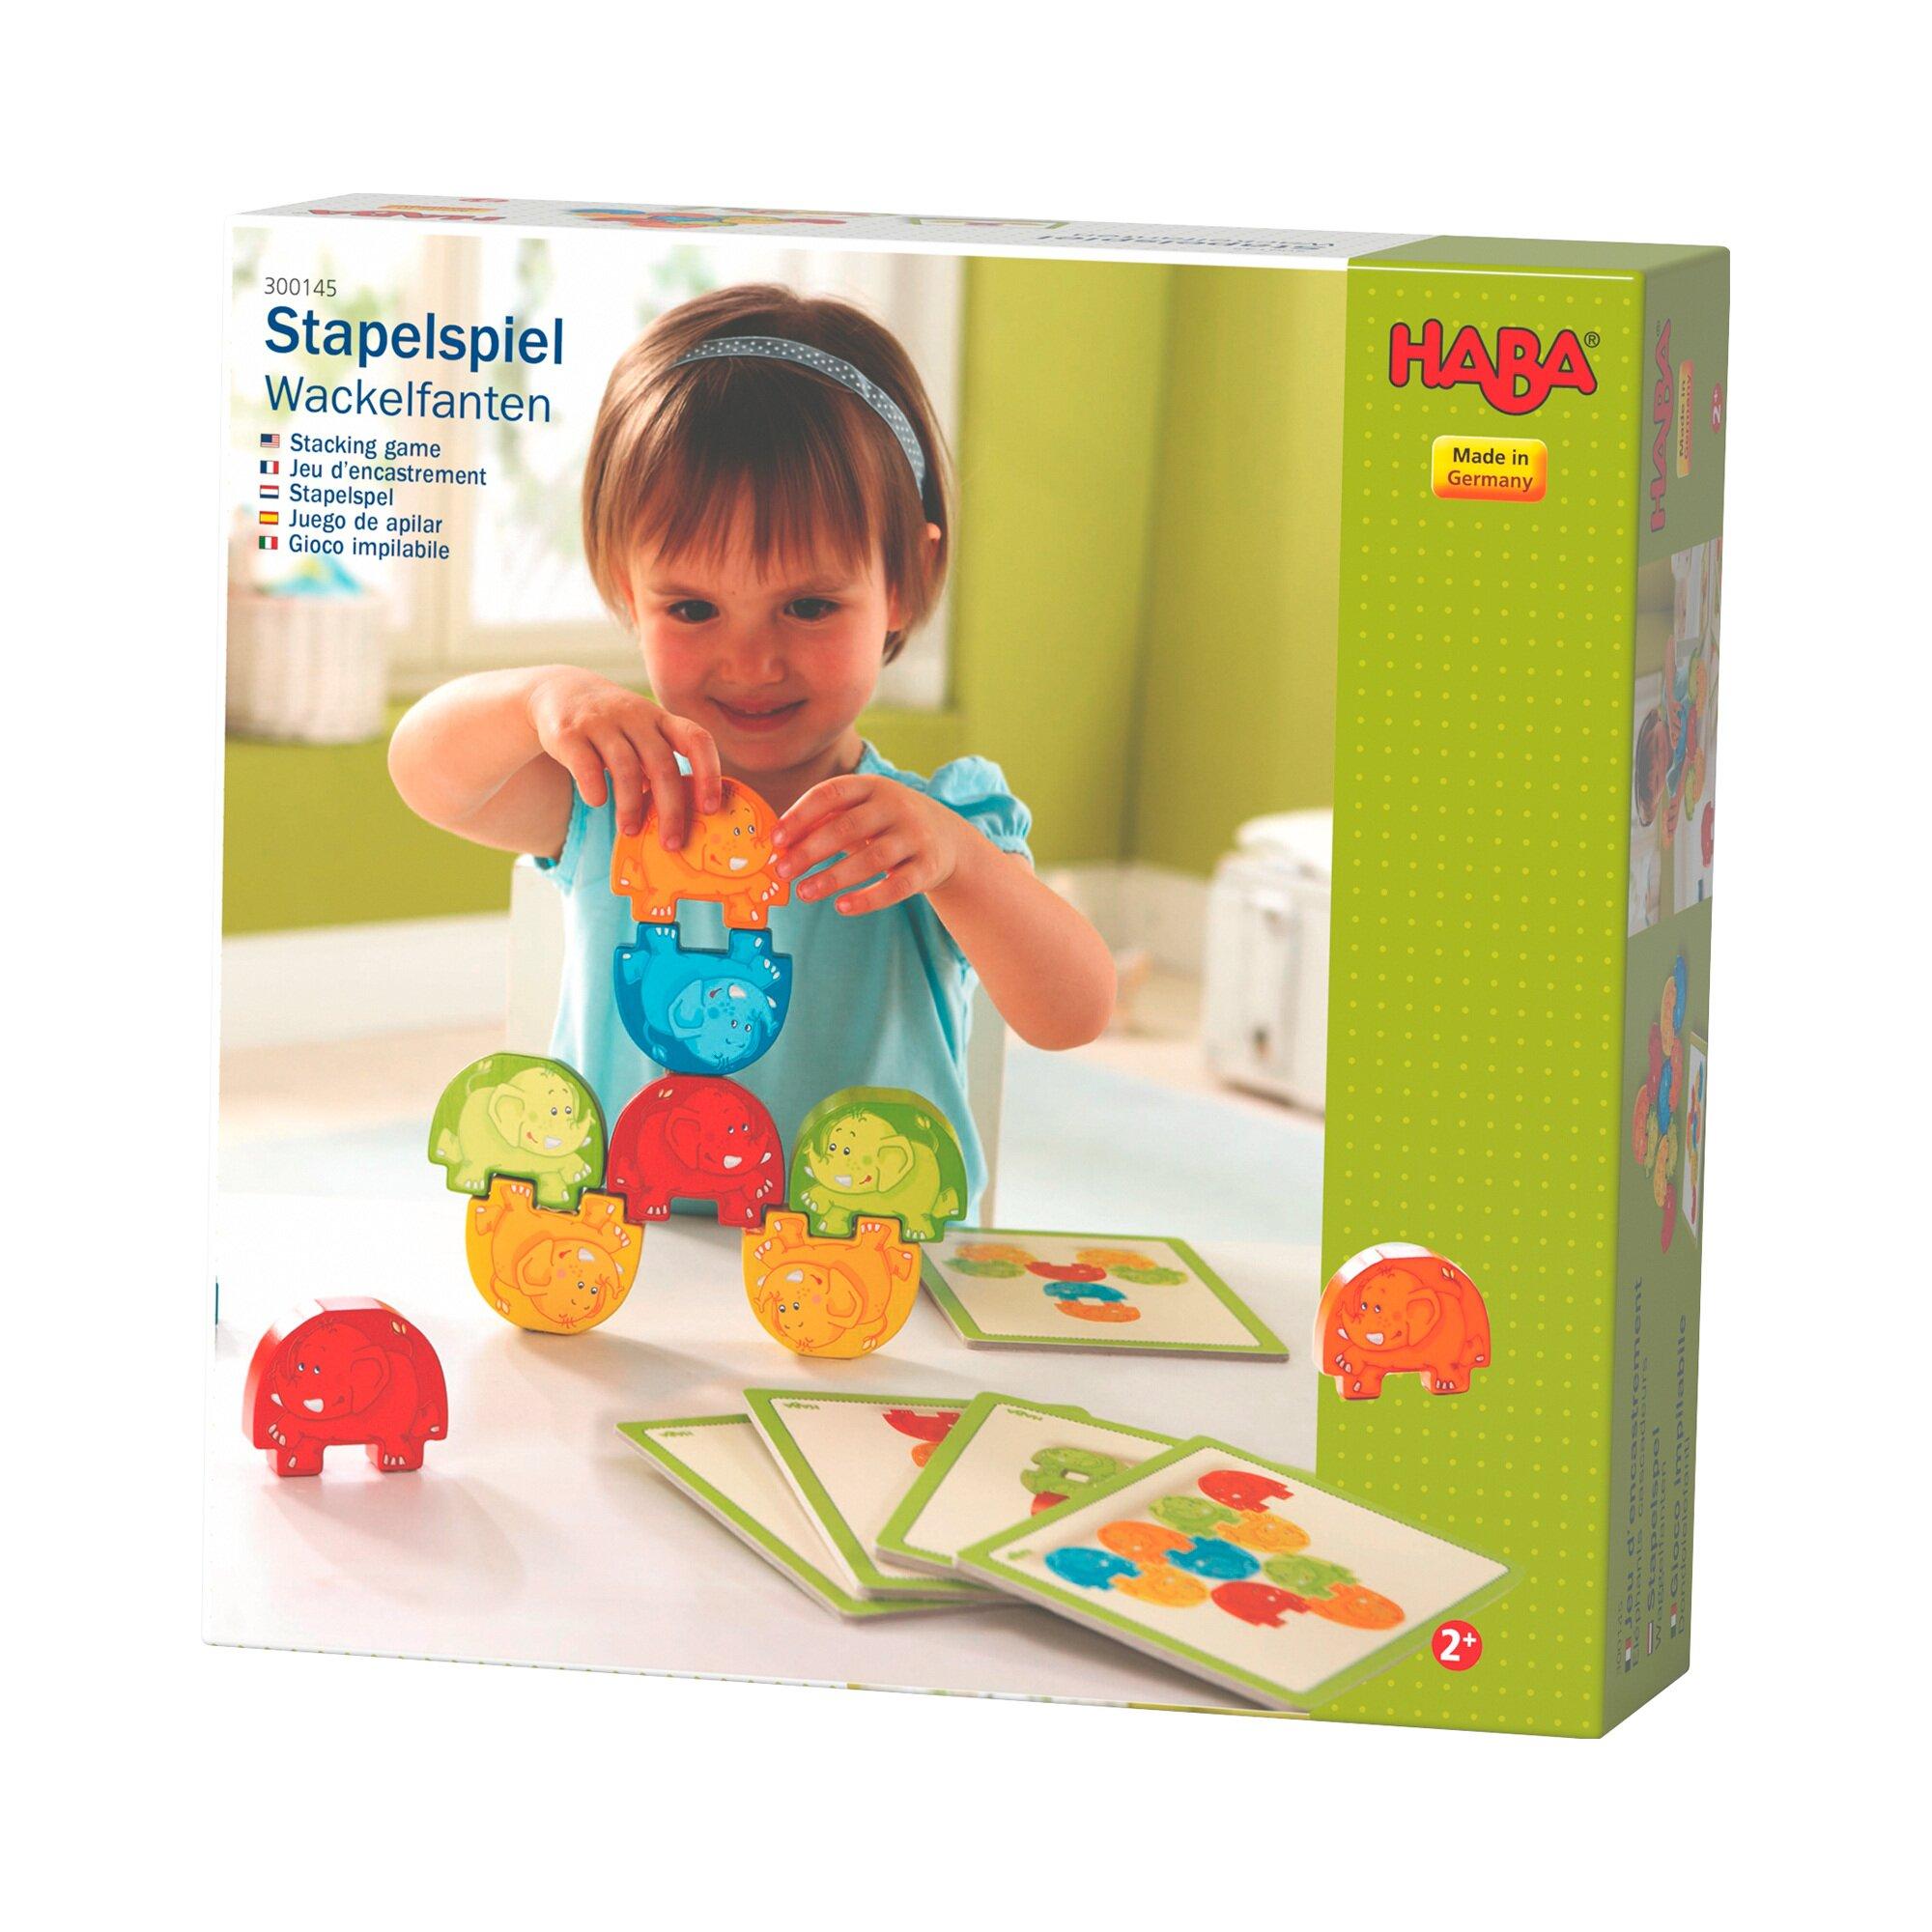 haba-stapelspiel-stapelspiel-wackelfanten